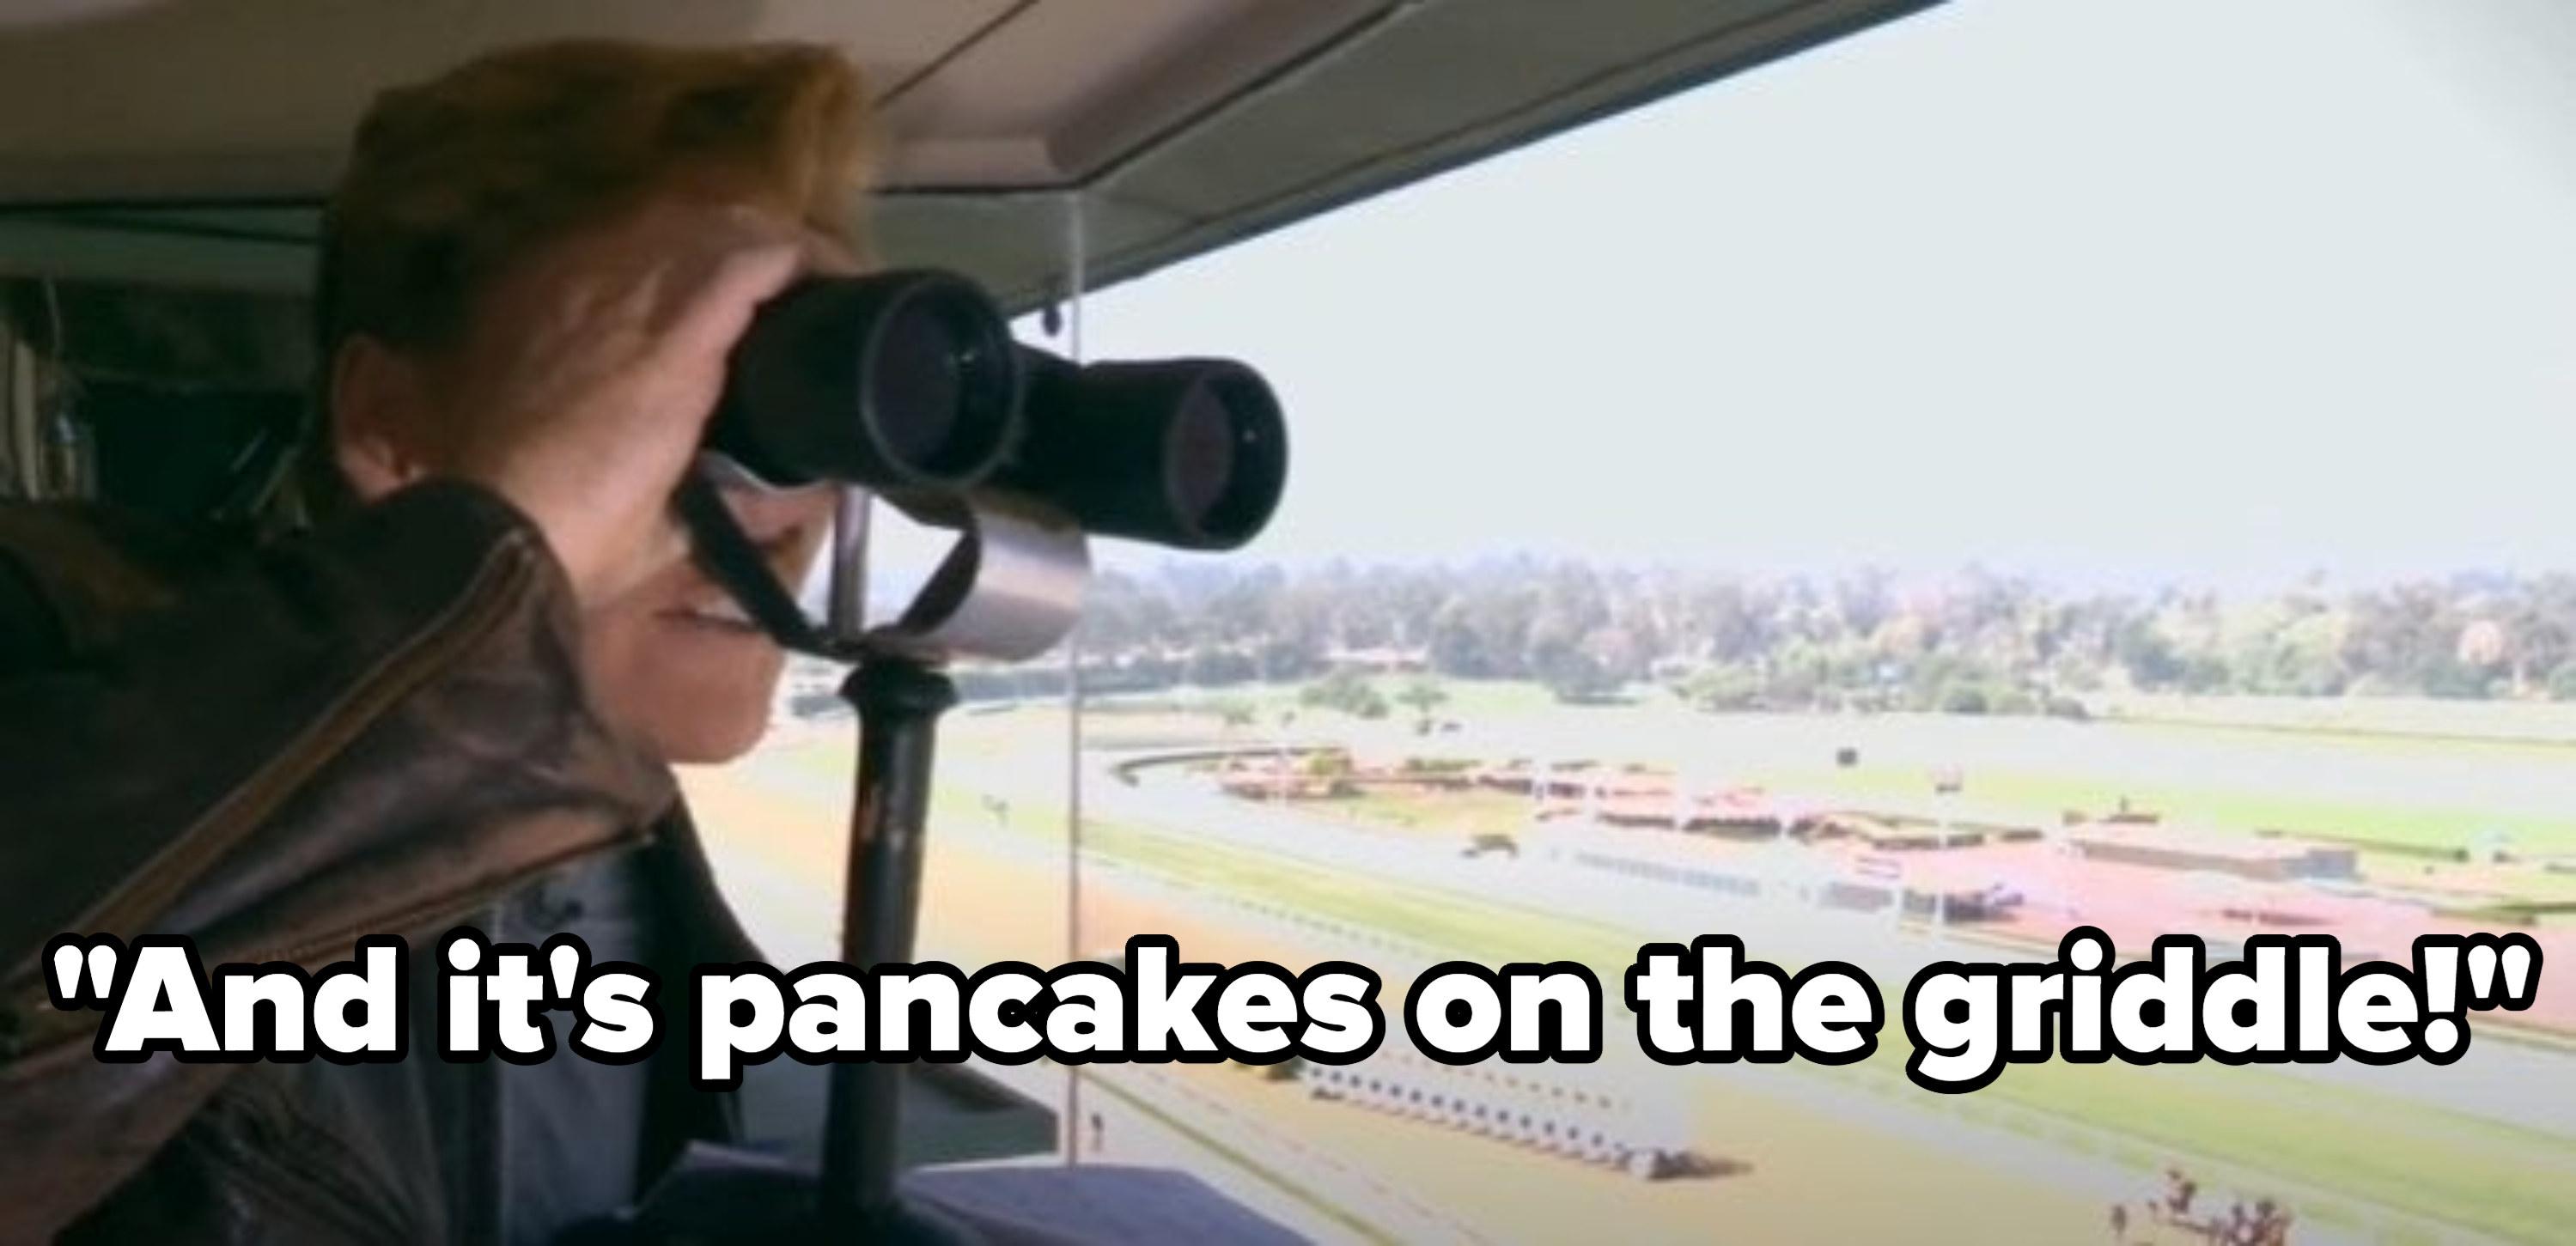 Conan looks through binoculars